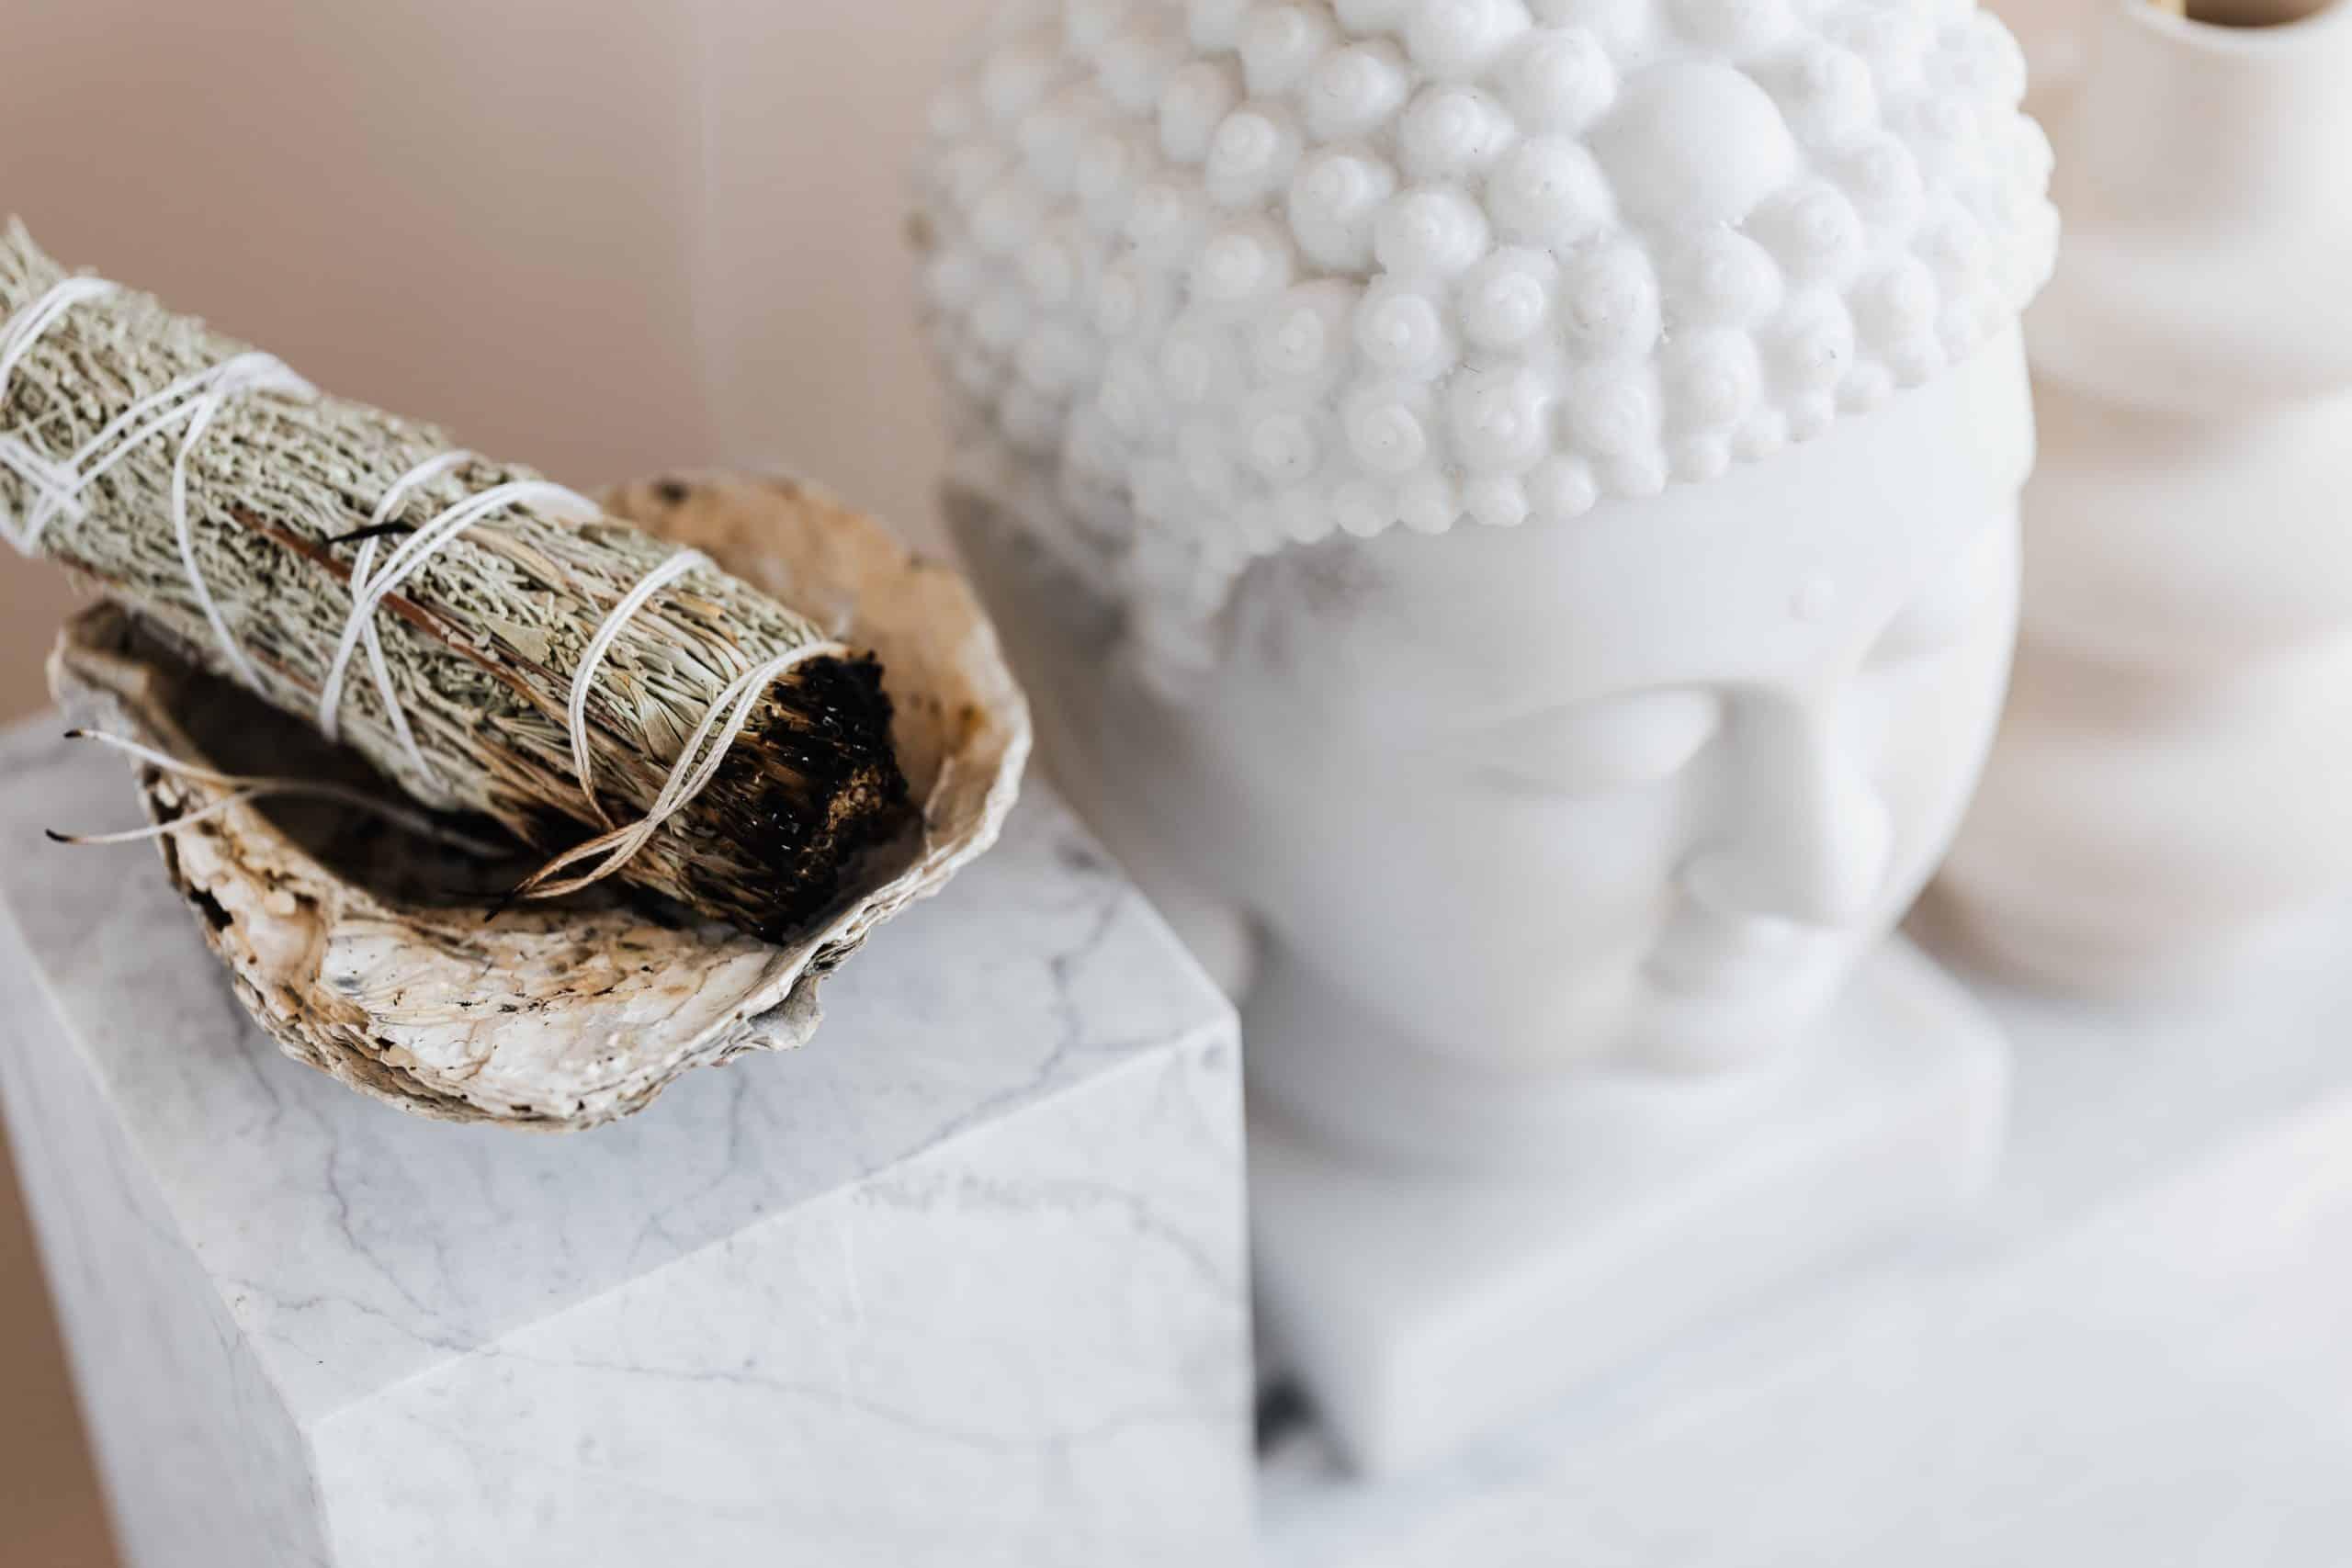 Autogenes Training Yoga Nidra und Meditation